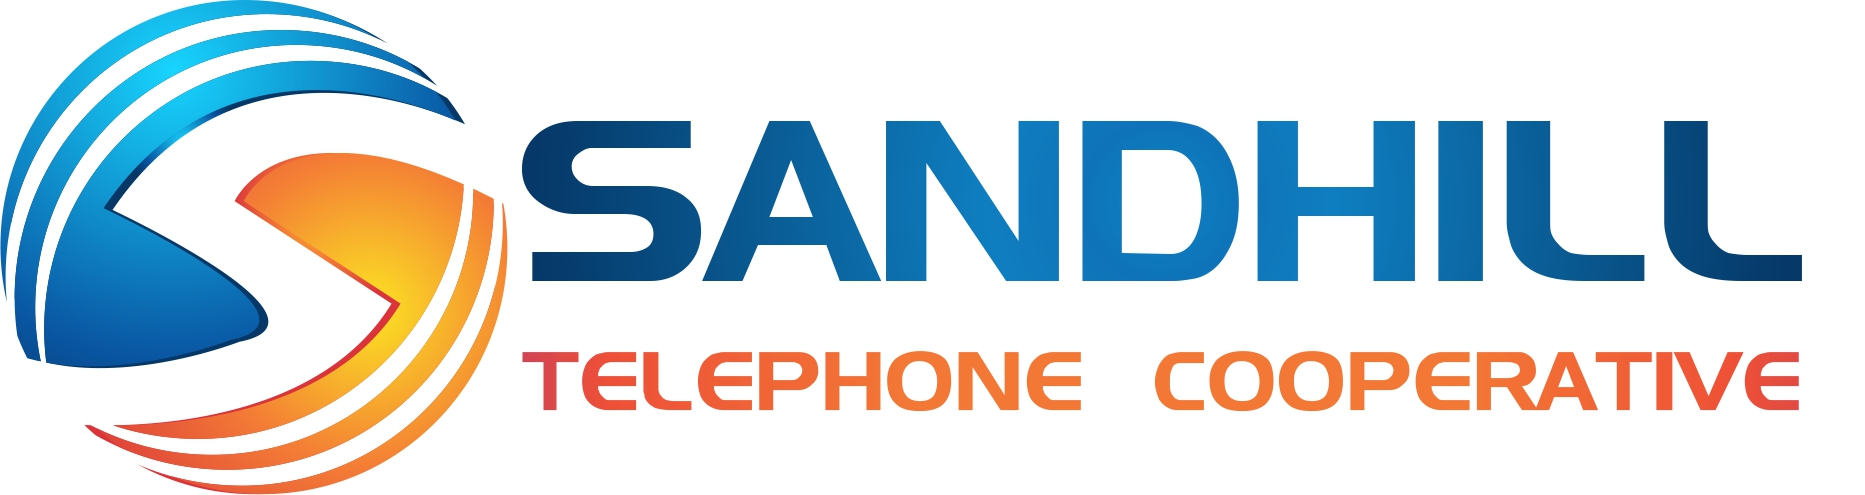 Sandhill Telephone Cooperative logo.